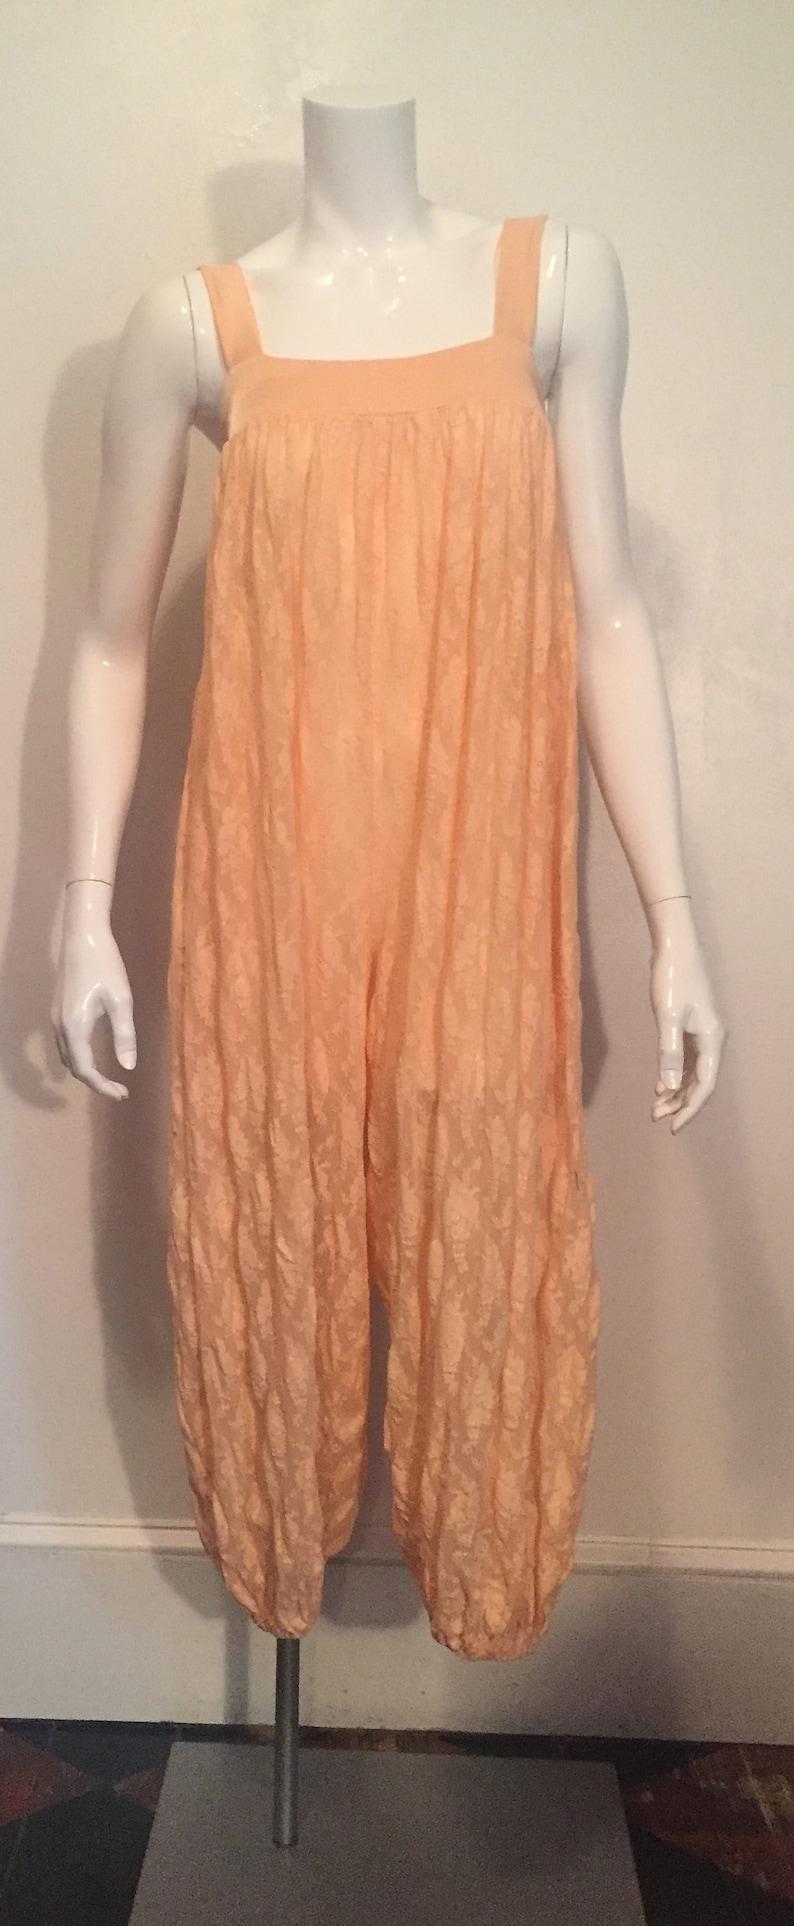 b9f4b6672469 1980 s peach lace pajama romper set by Ste Jan Marie